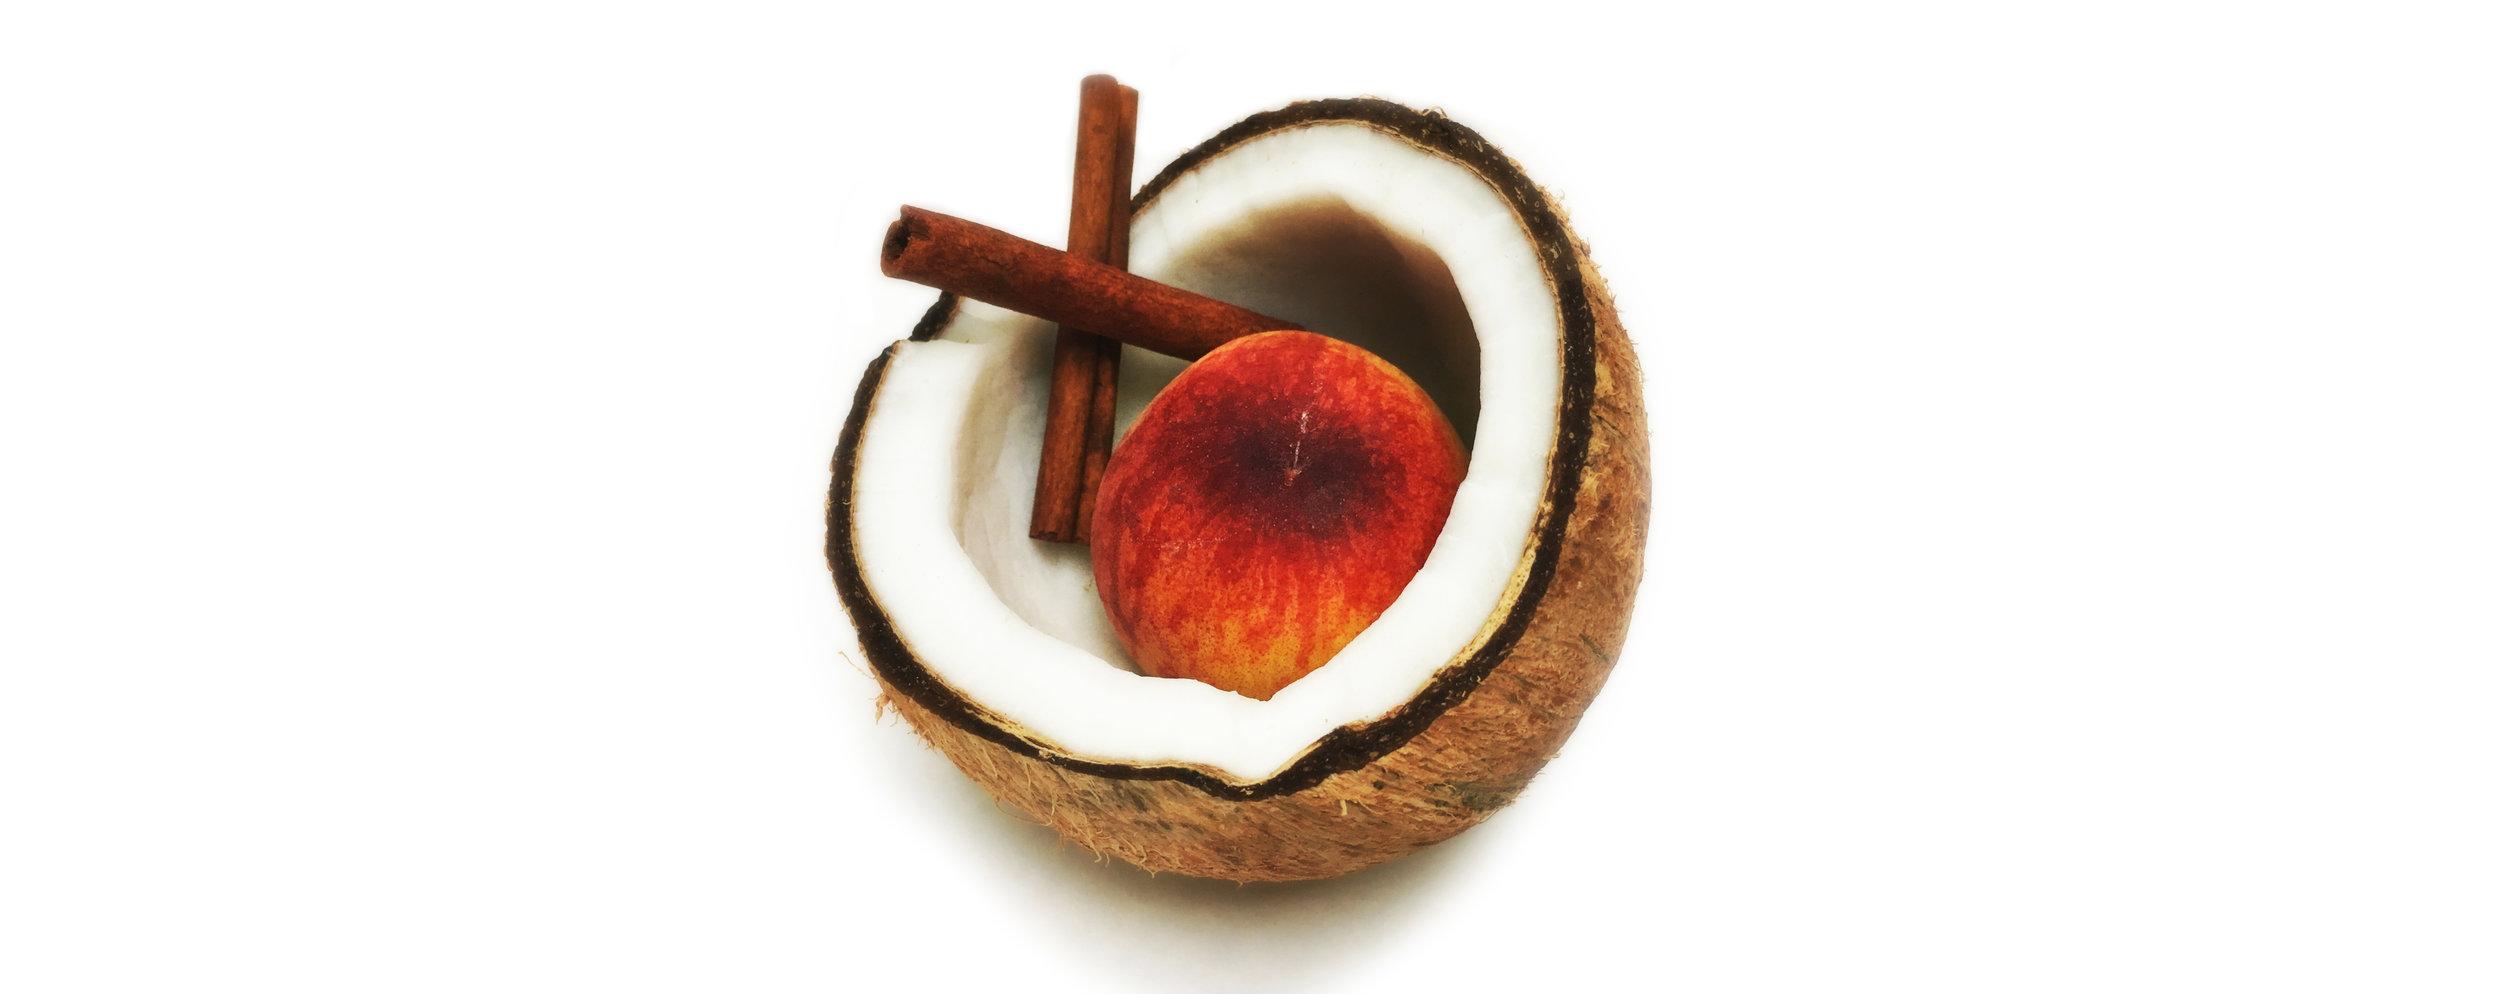 Coconut with Peach and Cinnamon sticks_wide.jpg